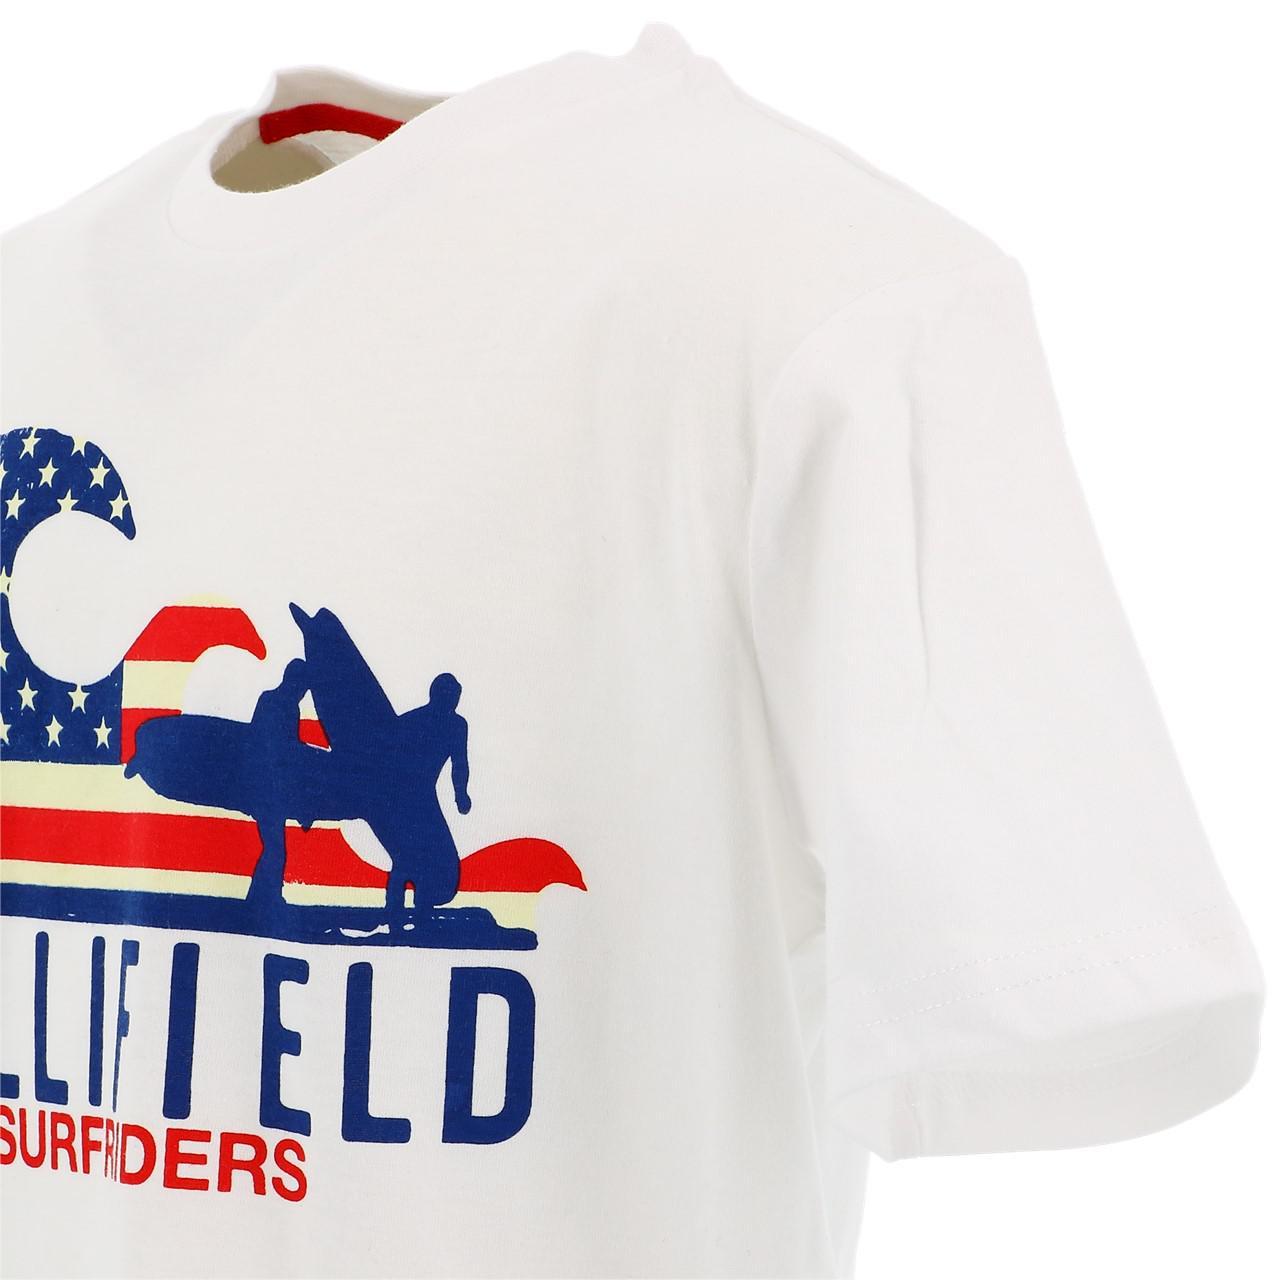 Tee-shirt-manches-courtes-Hollifield-Largo-blanc-mc-tee-jr-sp2-Blanc-17469-Neu miniature 3